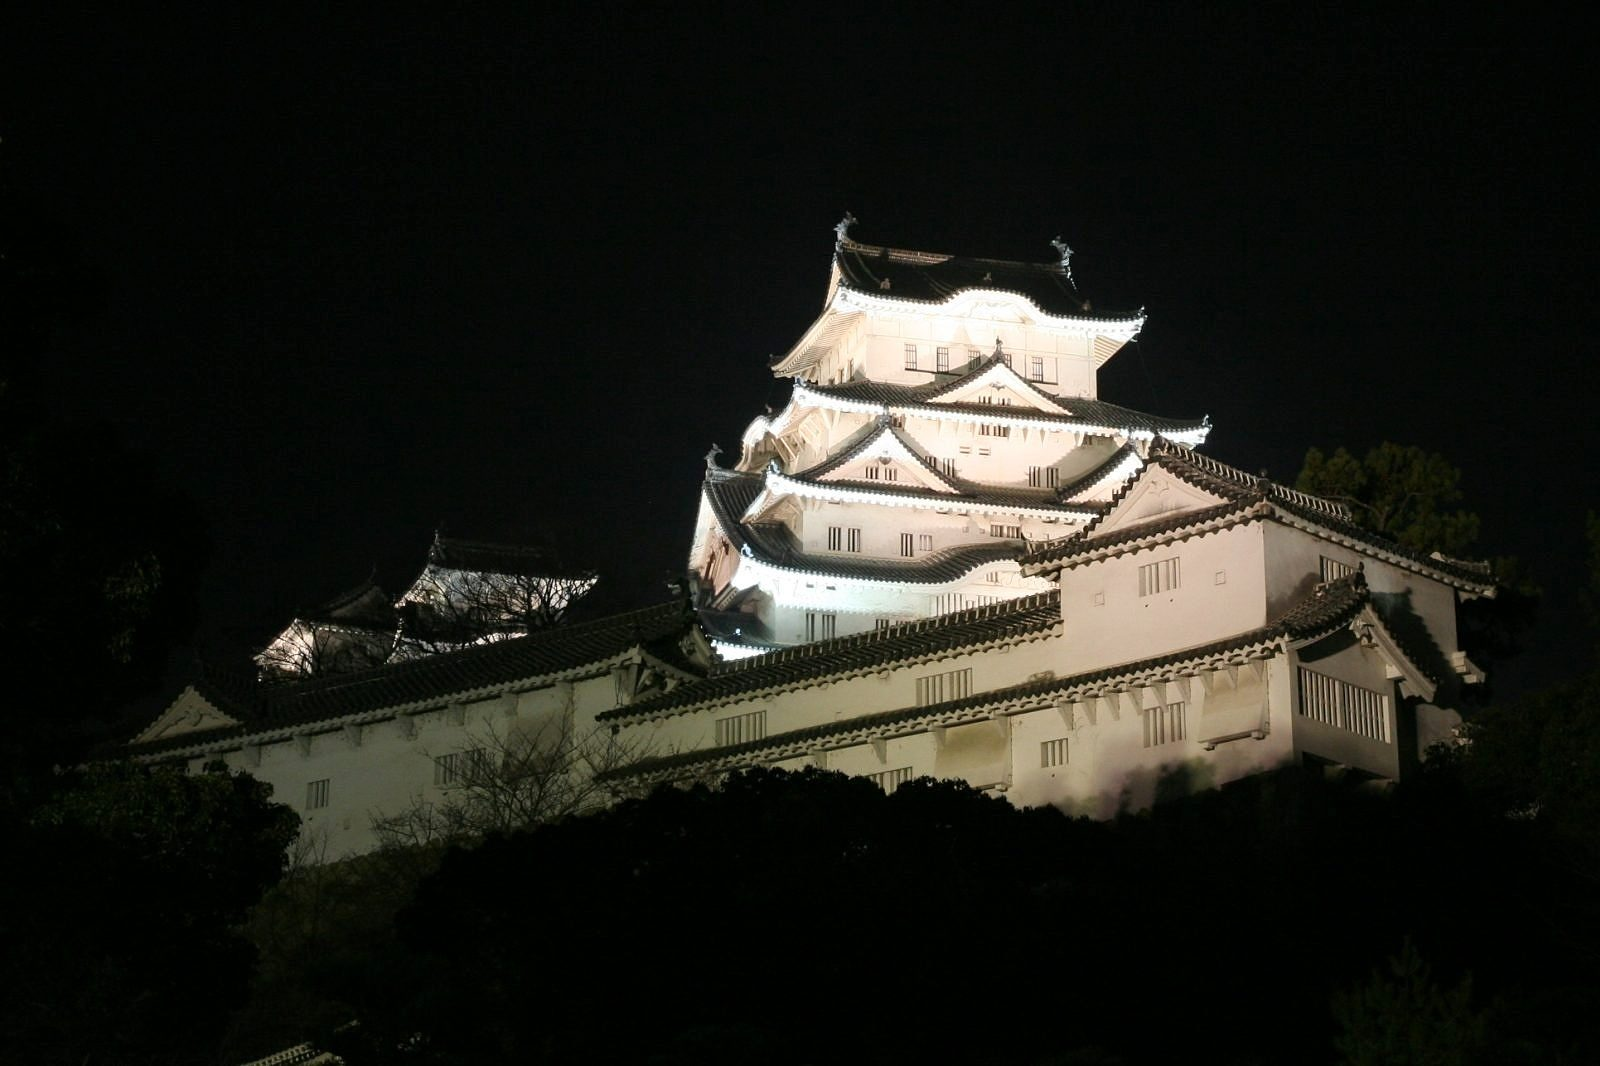 The White Fortress, Himeji-jo